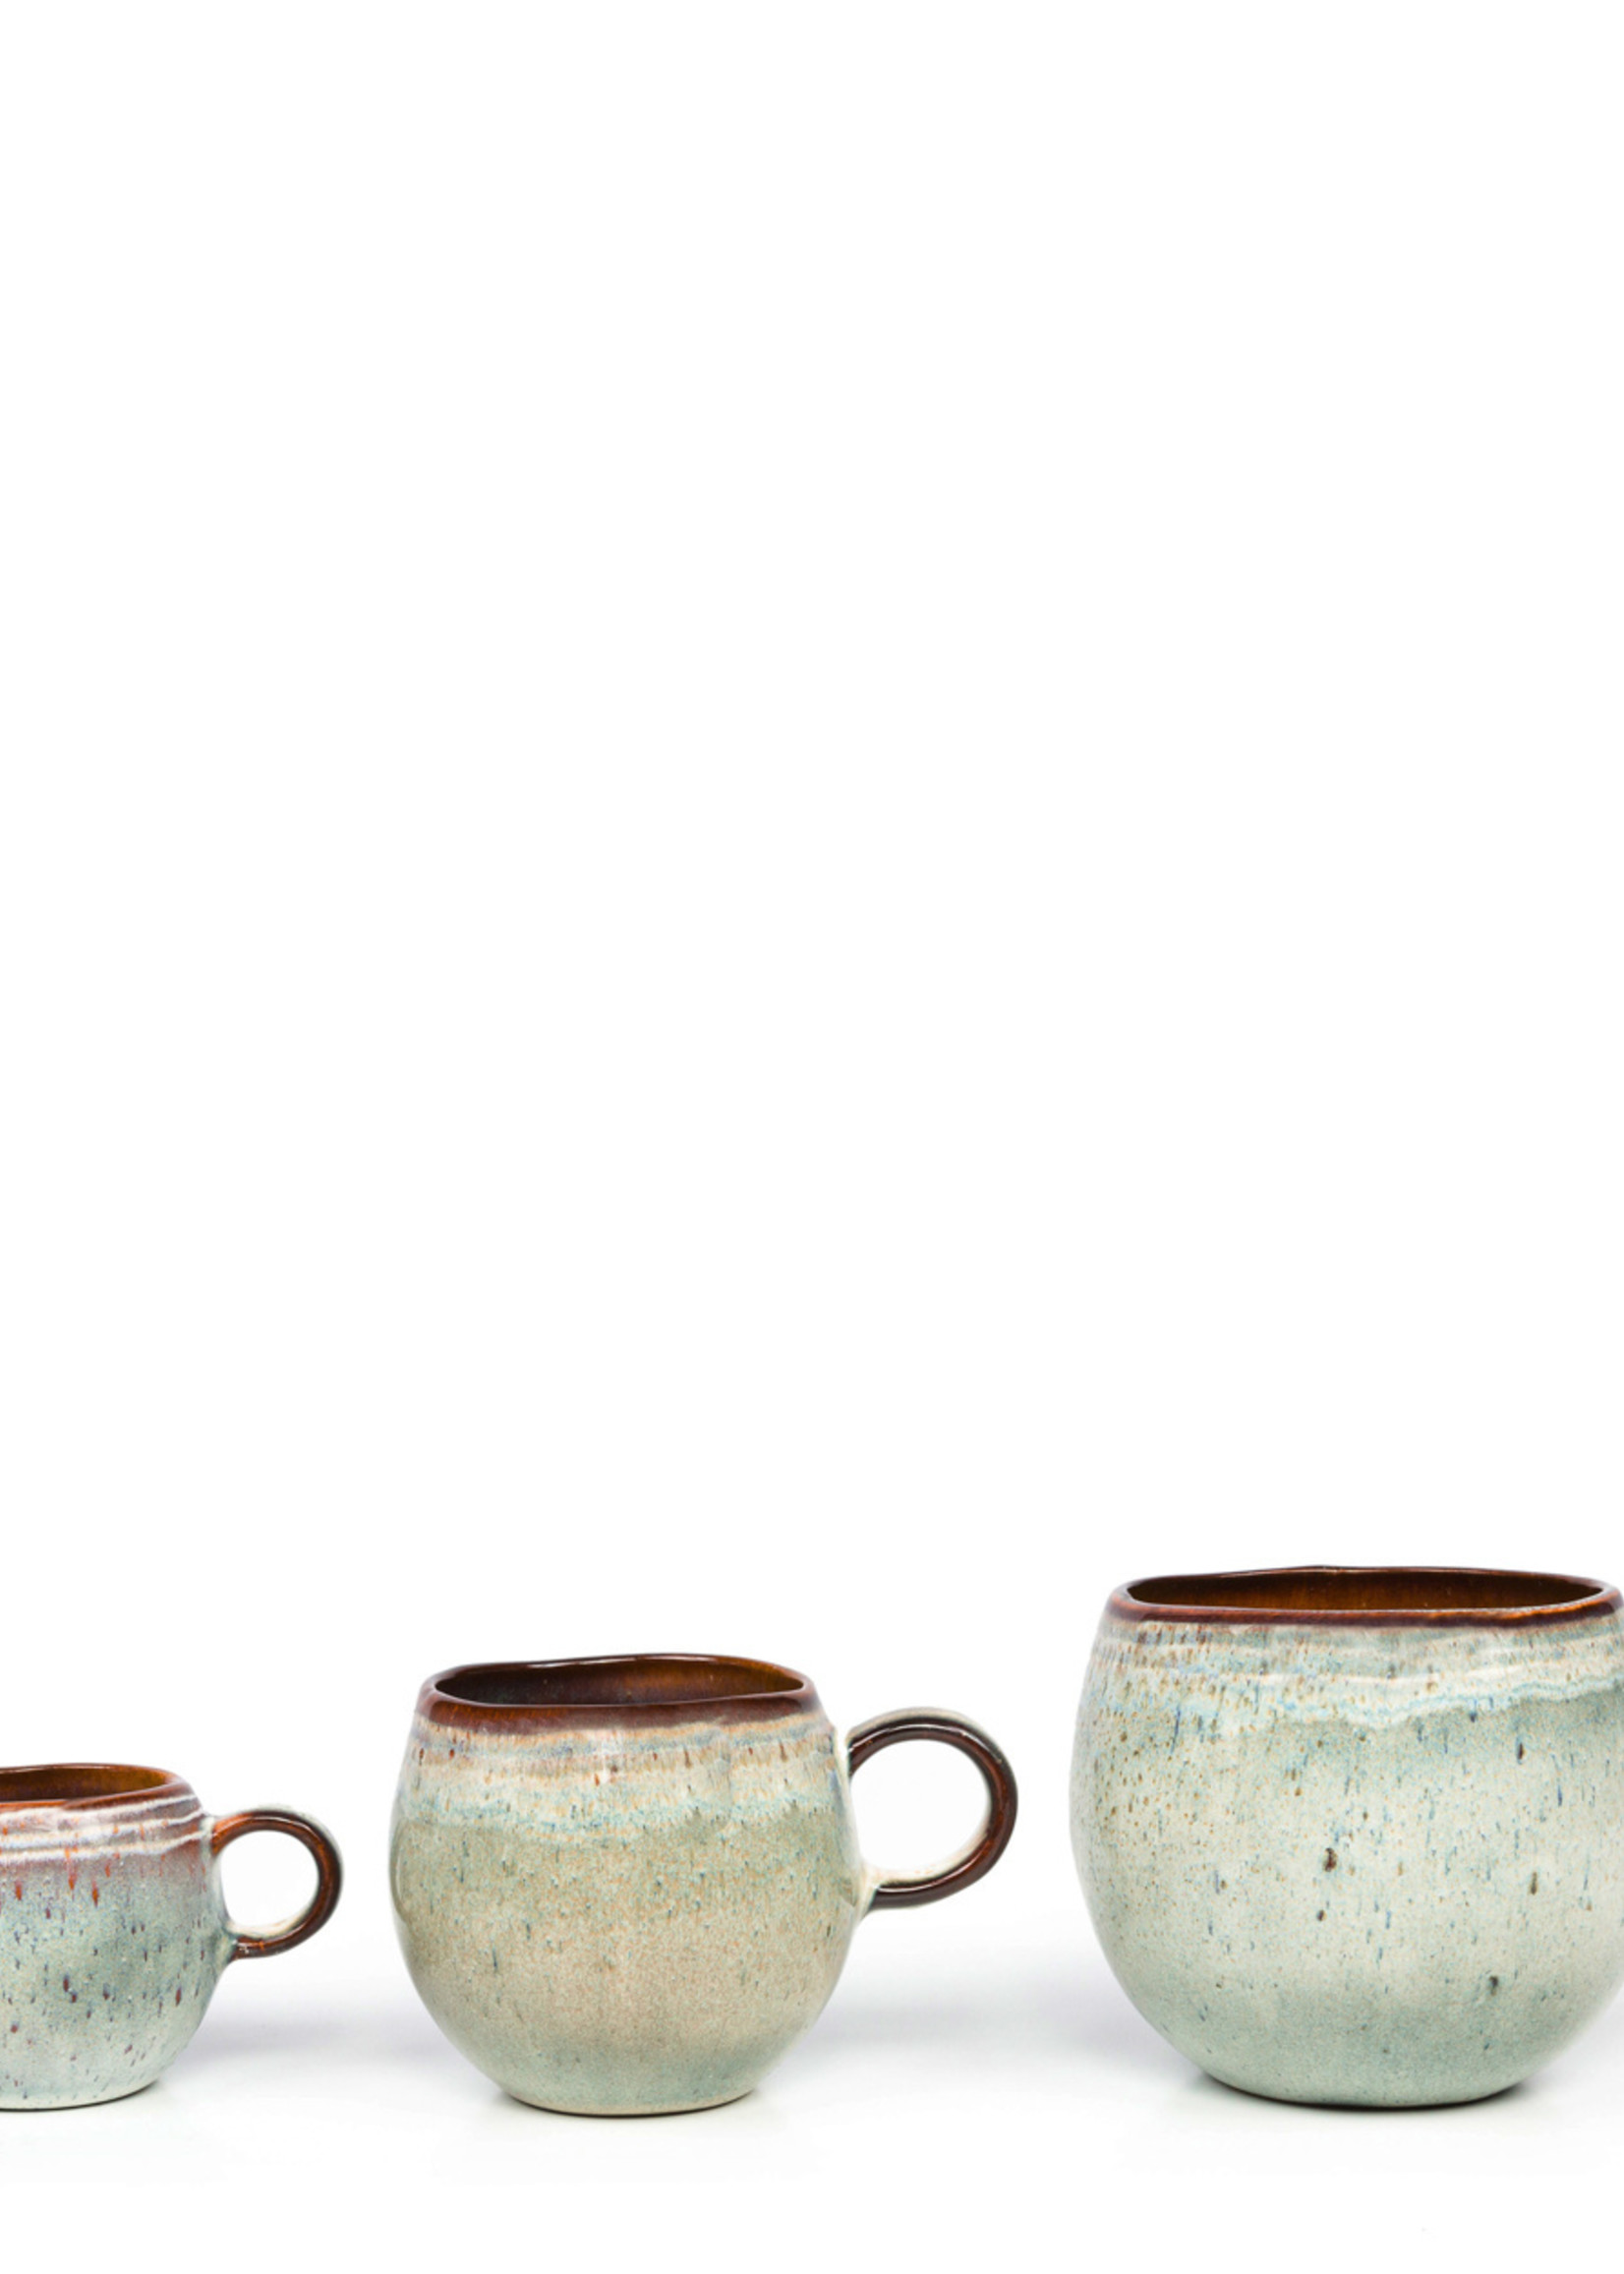 The Comporta Mug - M